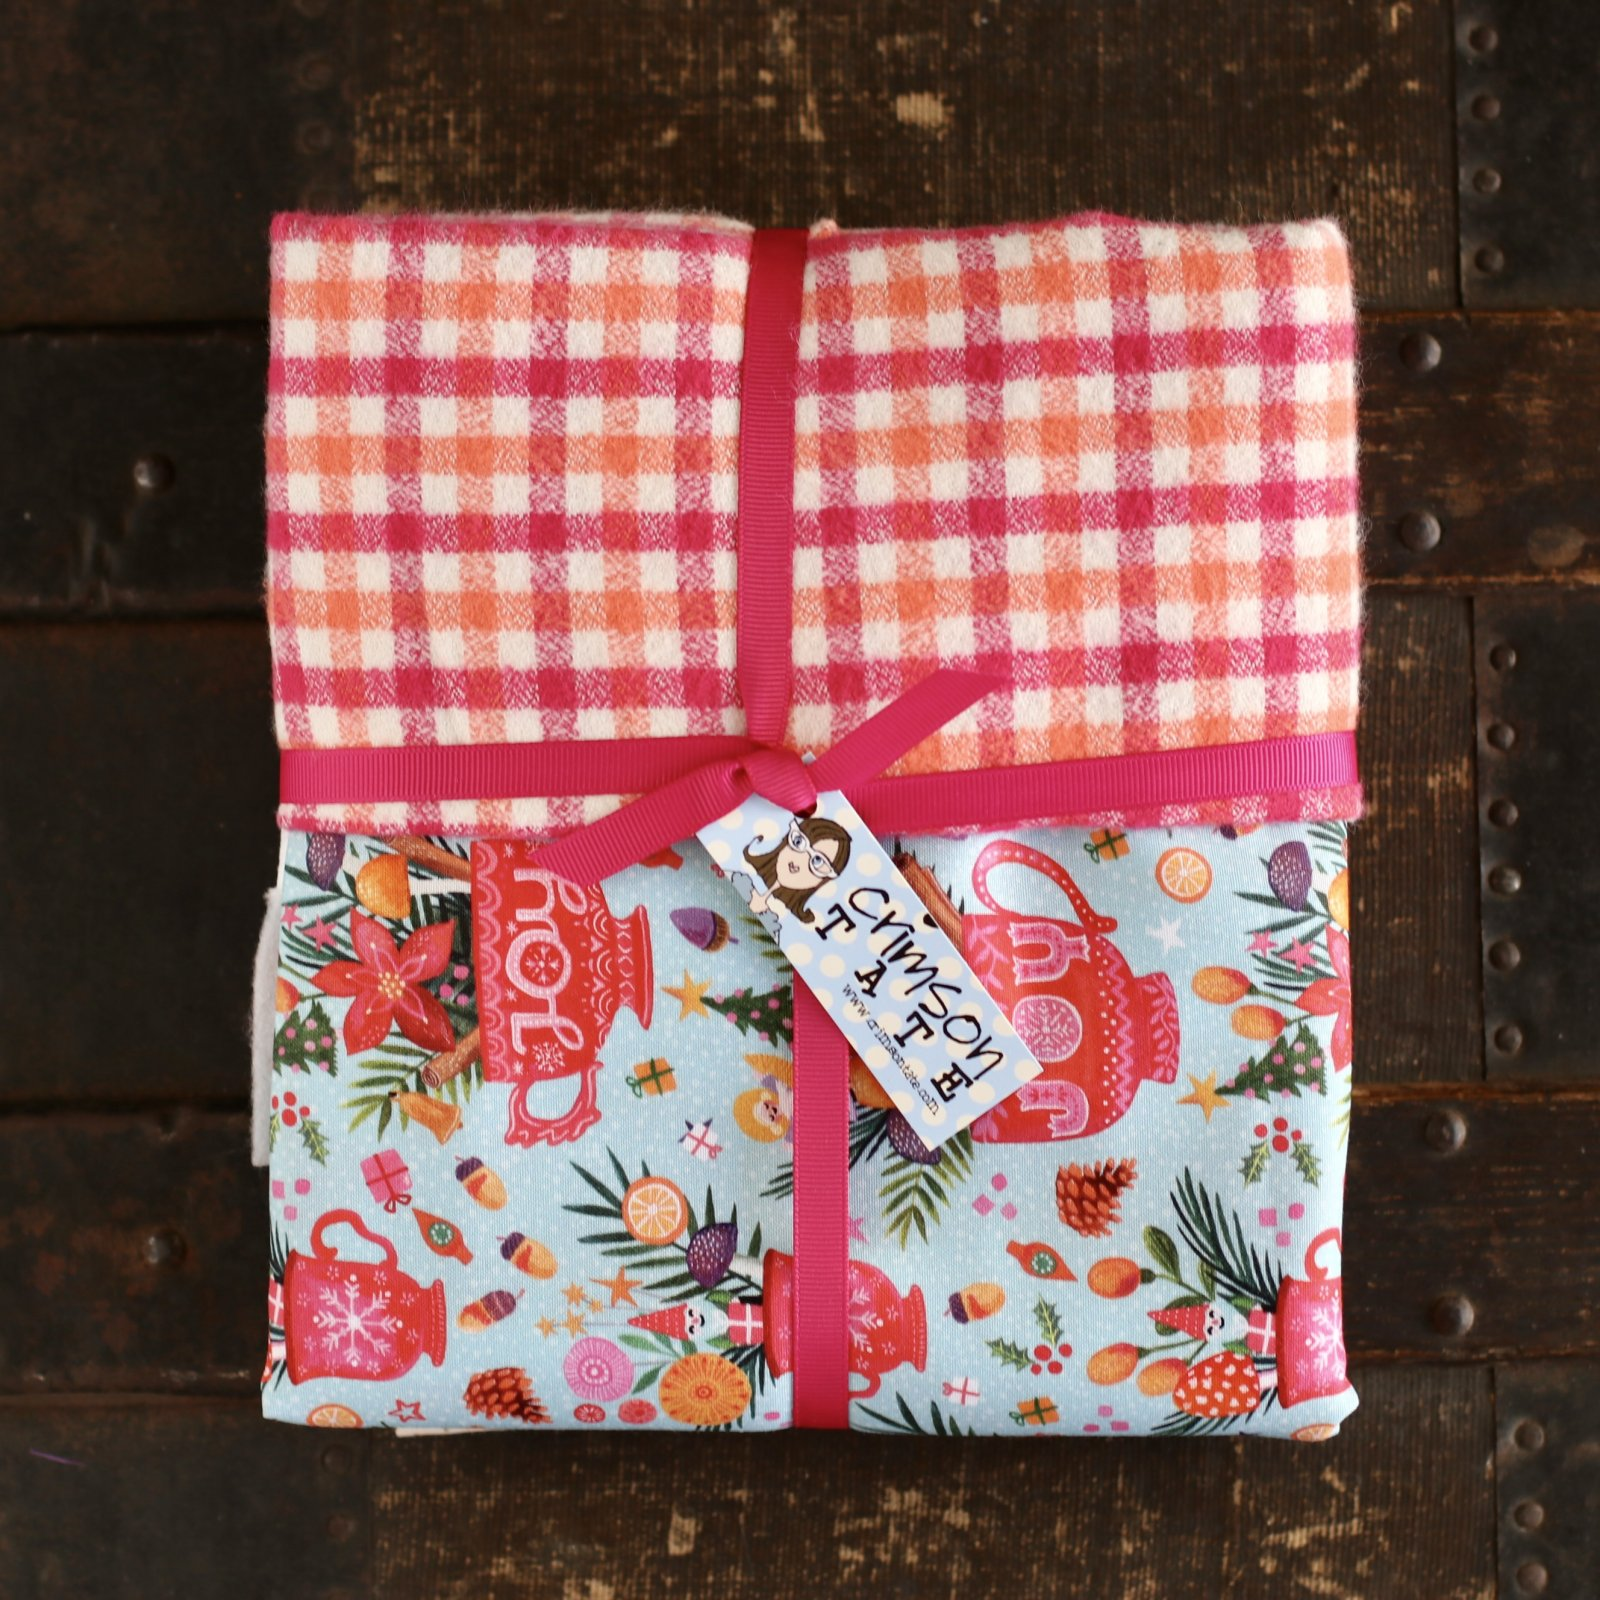 80s Joy Stocking Kit